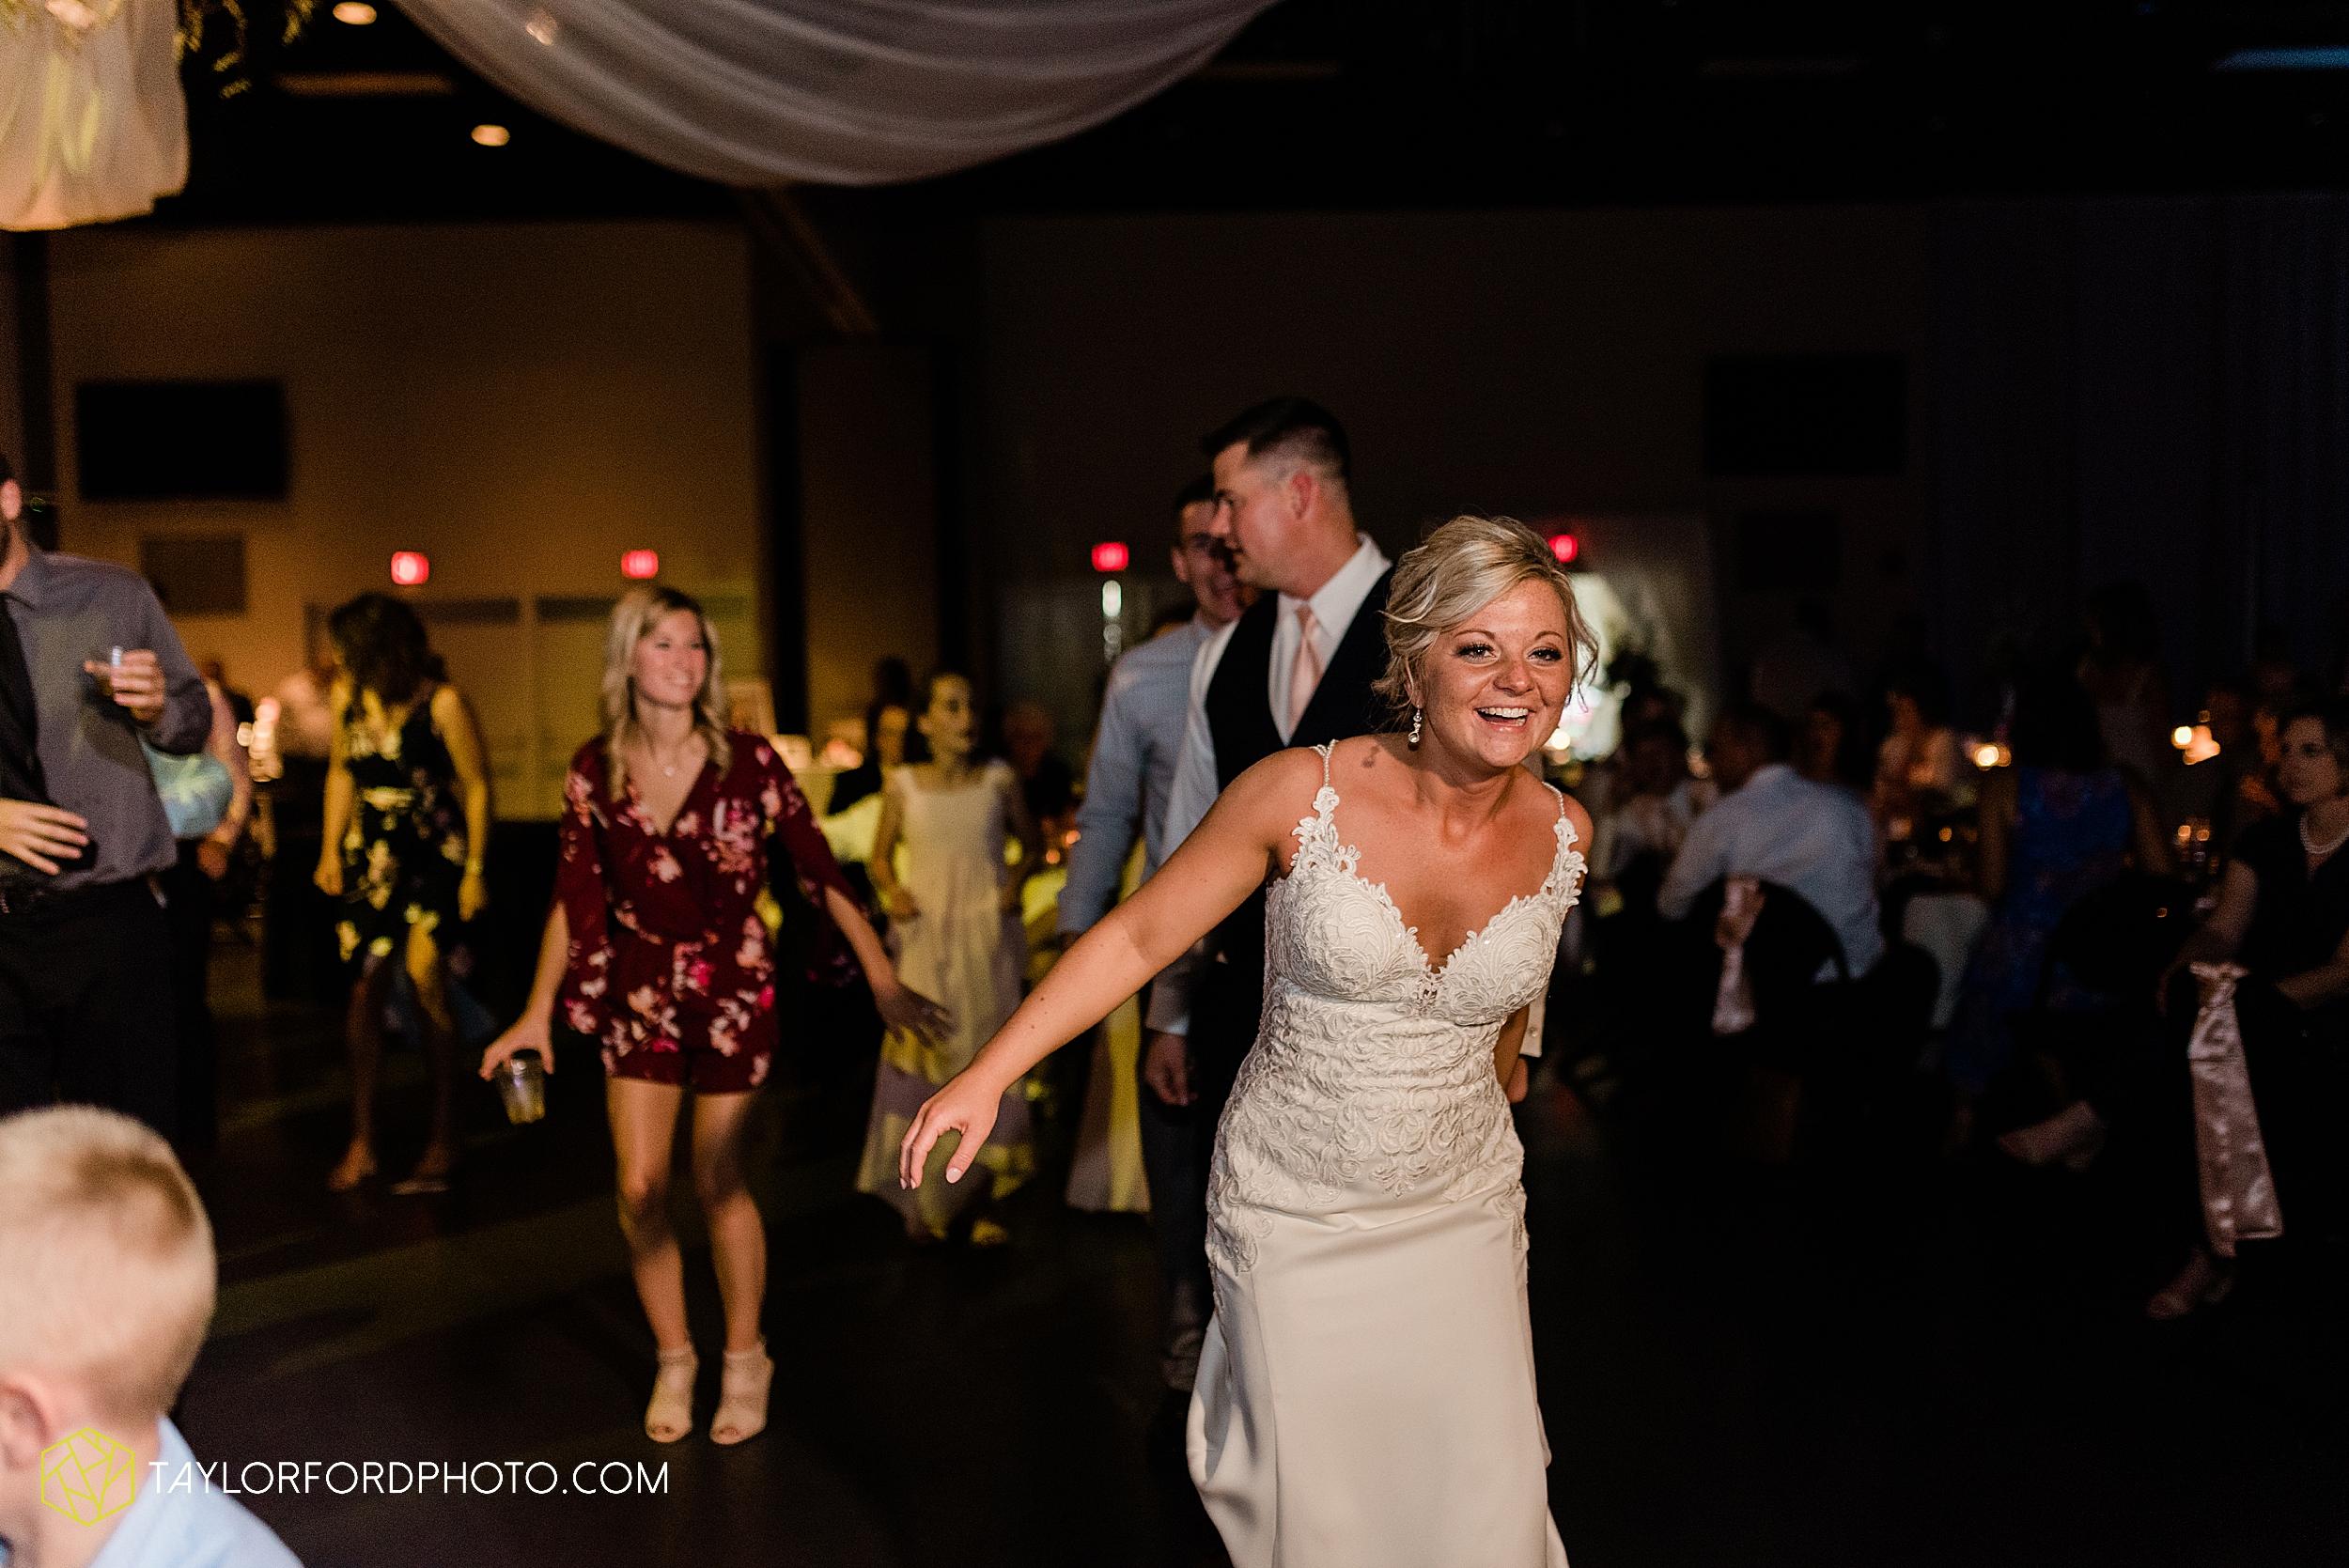 carly-trent-lima-elida-ohio-wedding-the-met-civic-center-reception-immanuel-united-methodist-church-photography-taylor-ford-hirschy-photographer_3405.jpg